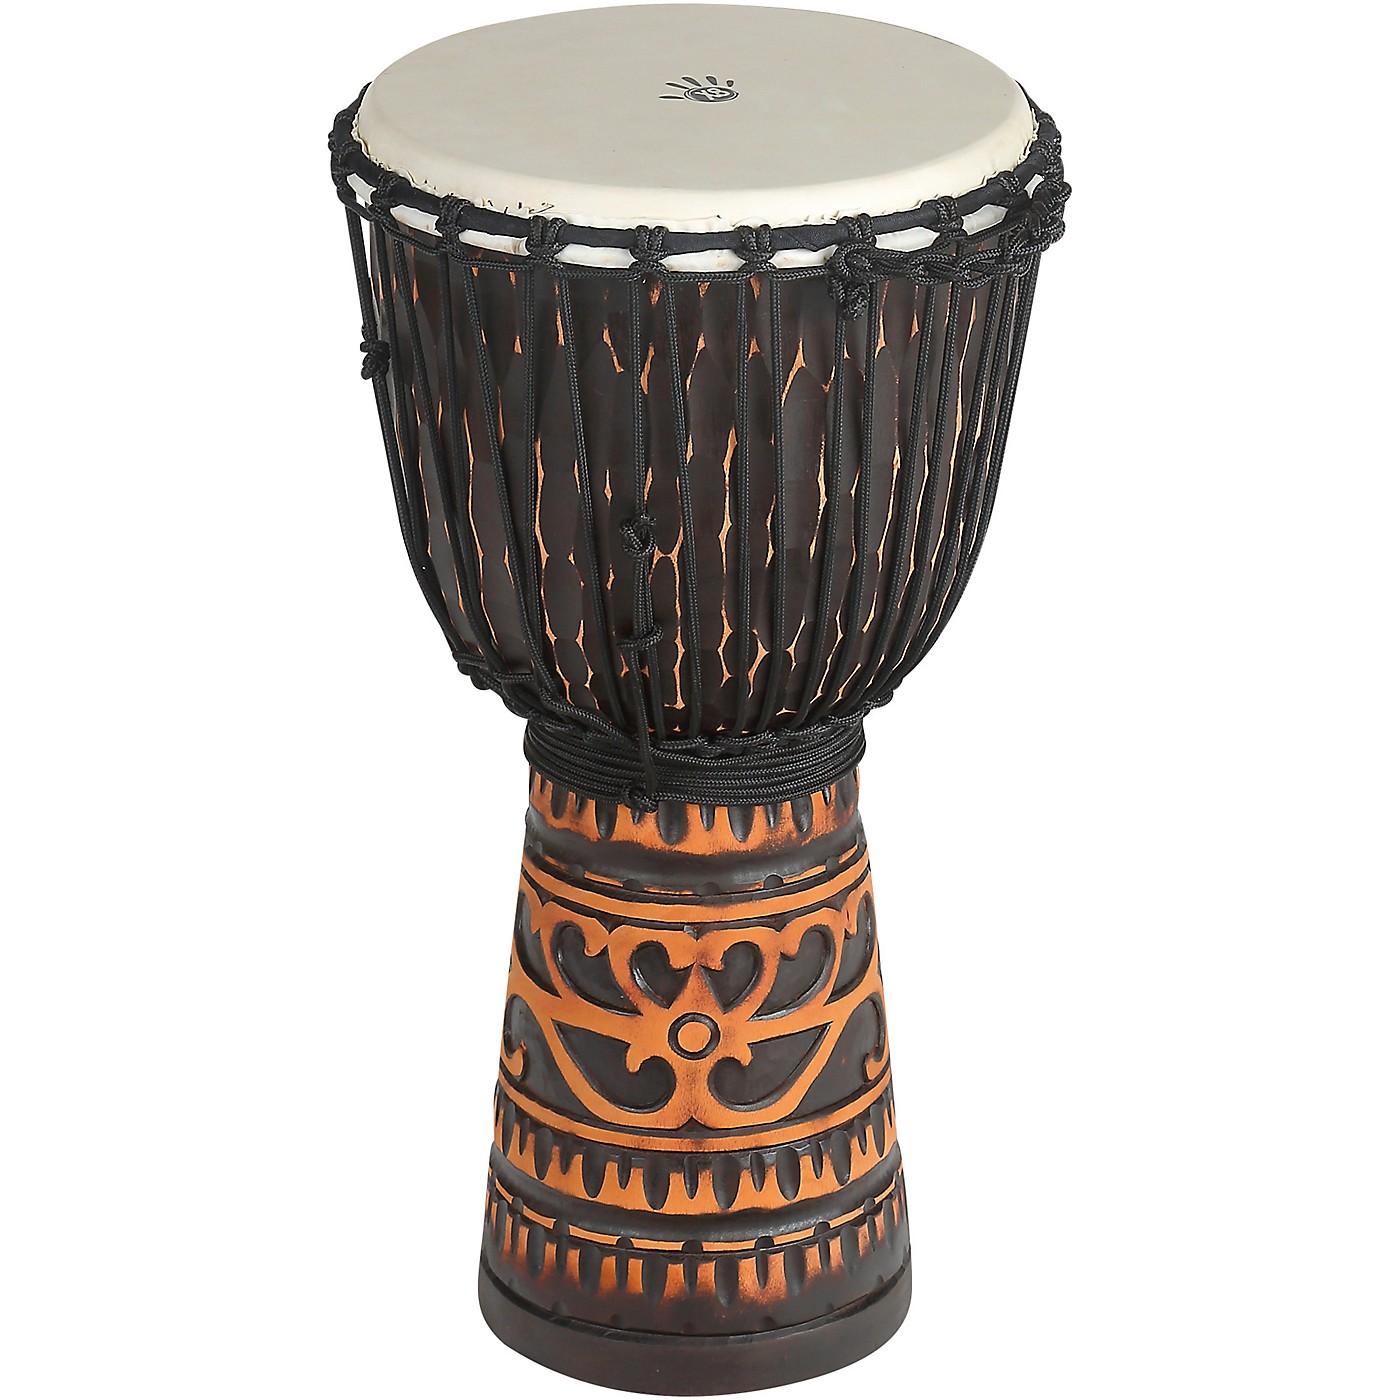 X8 Drums Deep Carve Antique Chocolate Djembe Drum thumbnail